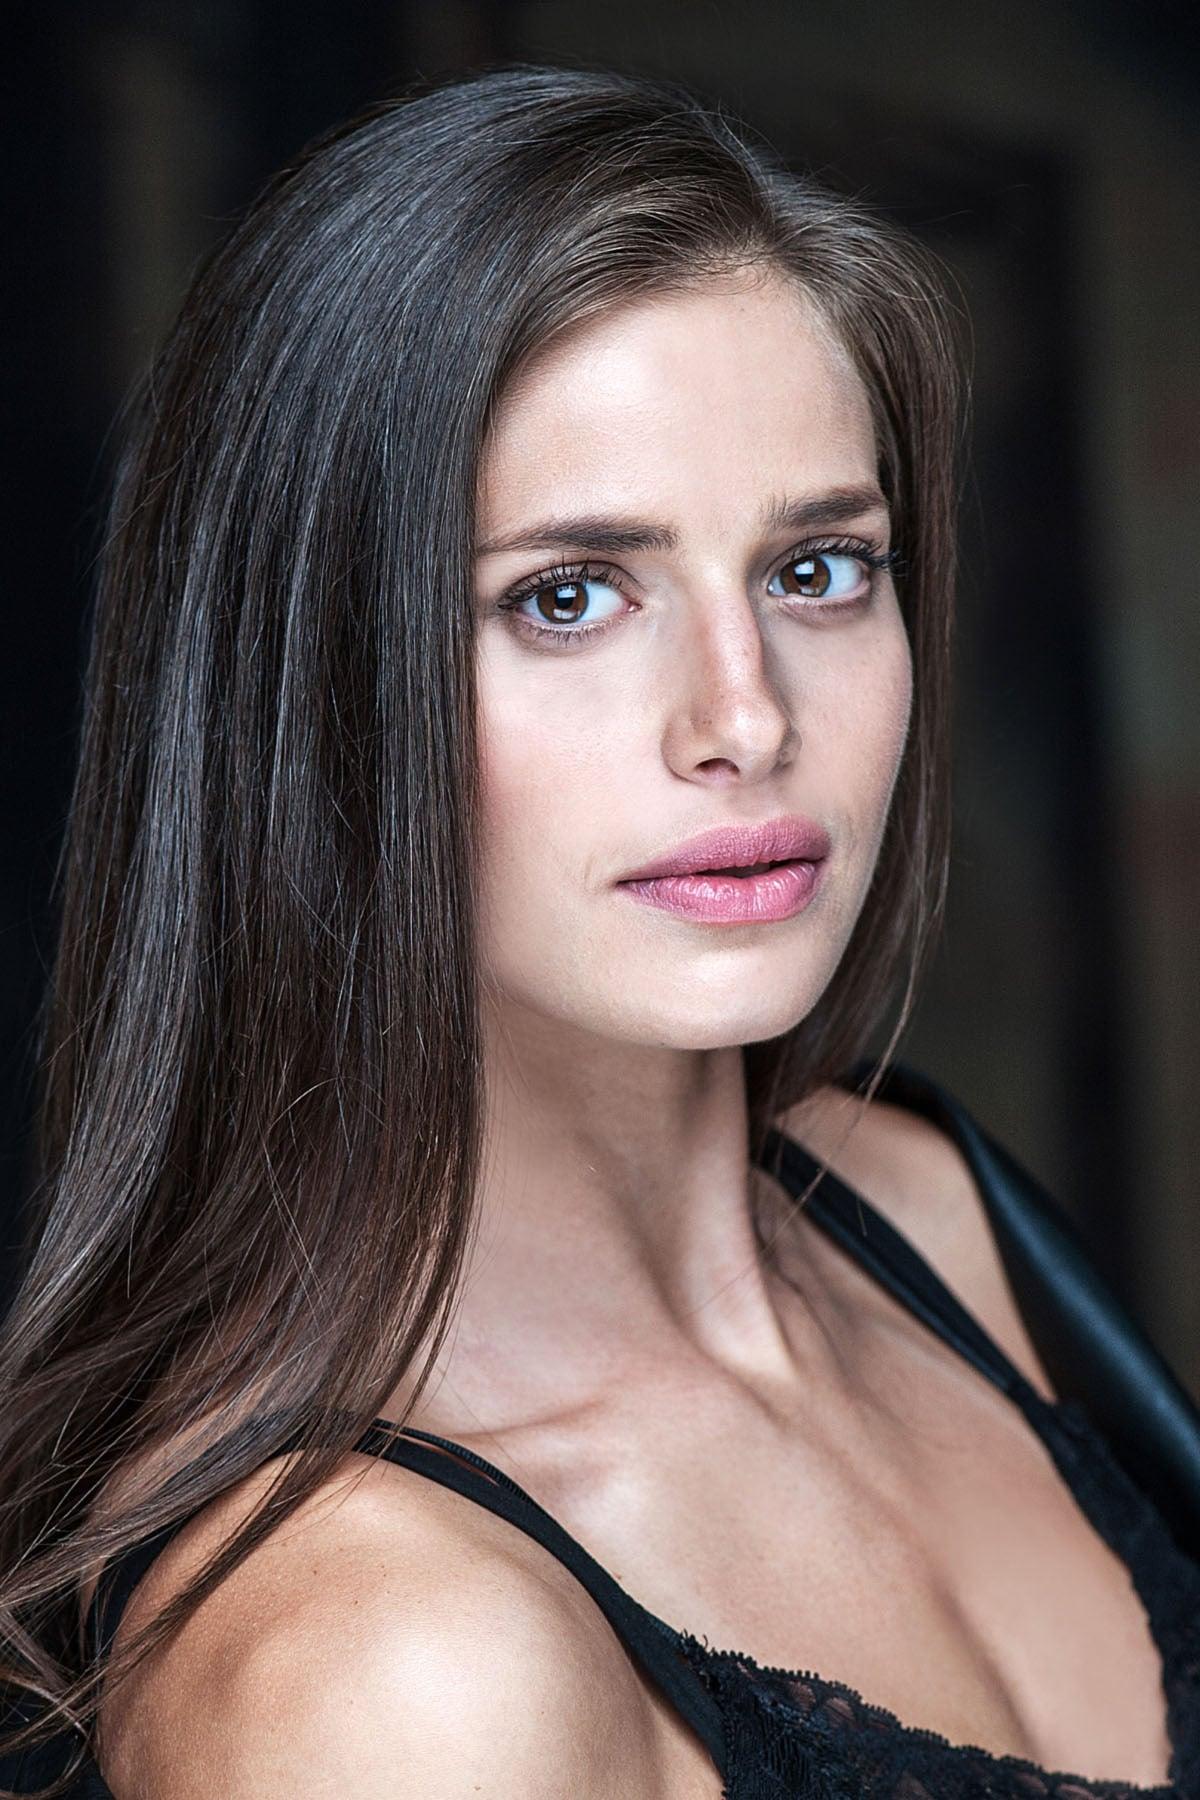 Rachel Sellan